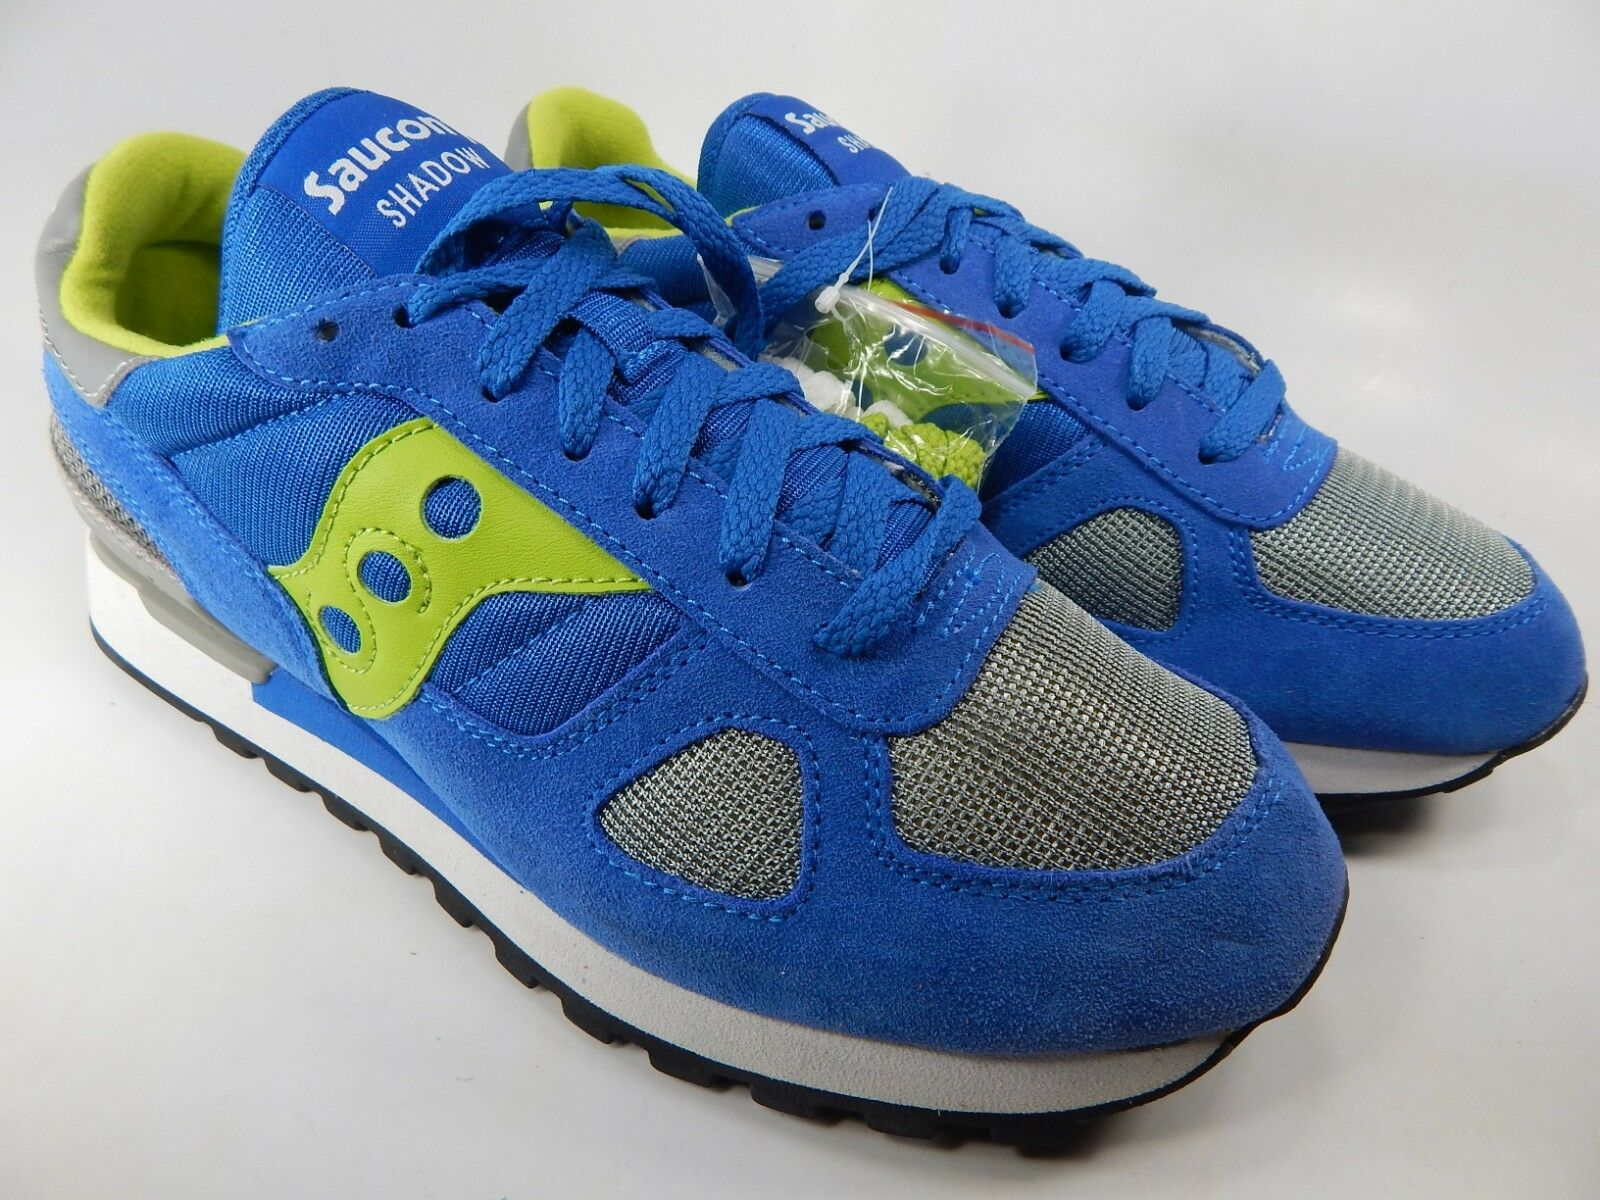 Saucony Shadow Original S2108-585 tamaño 9 m (D) EU 42.5 para hombres zapatos para correr azul